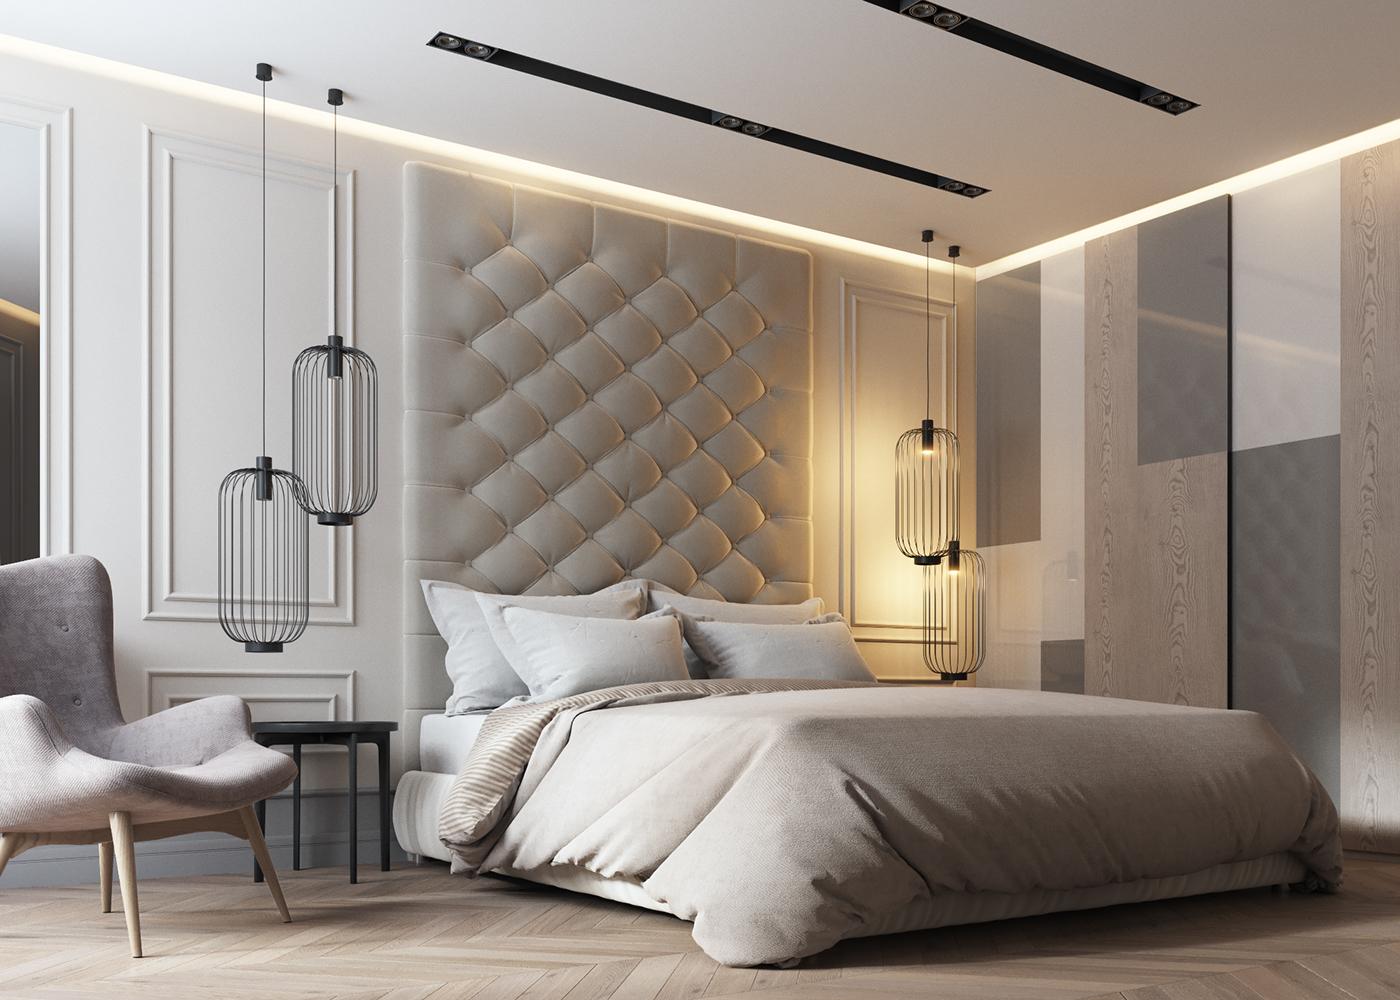 3ds max corona render  photoshop VizLine Studio ukraine apartments DE&DE Interior Studio